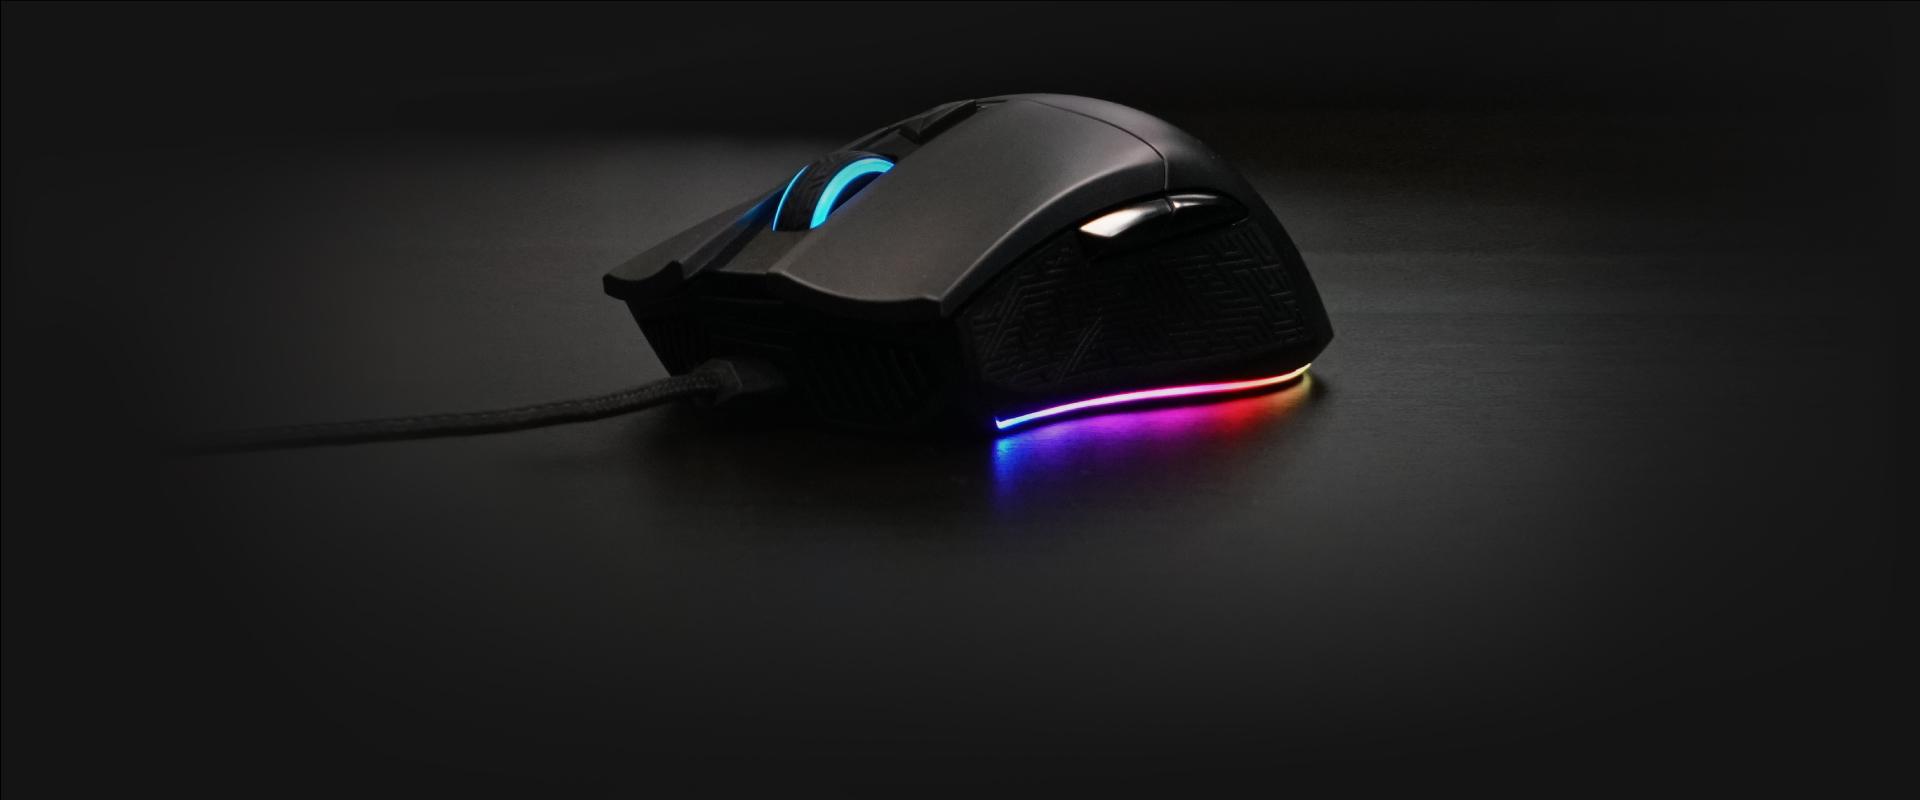 ASUS ROG Gladius II Core mouse